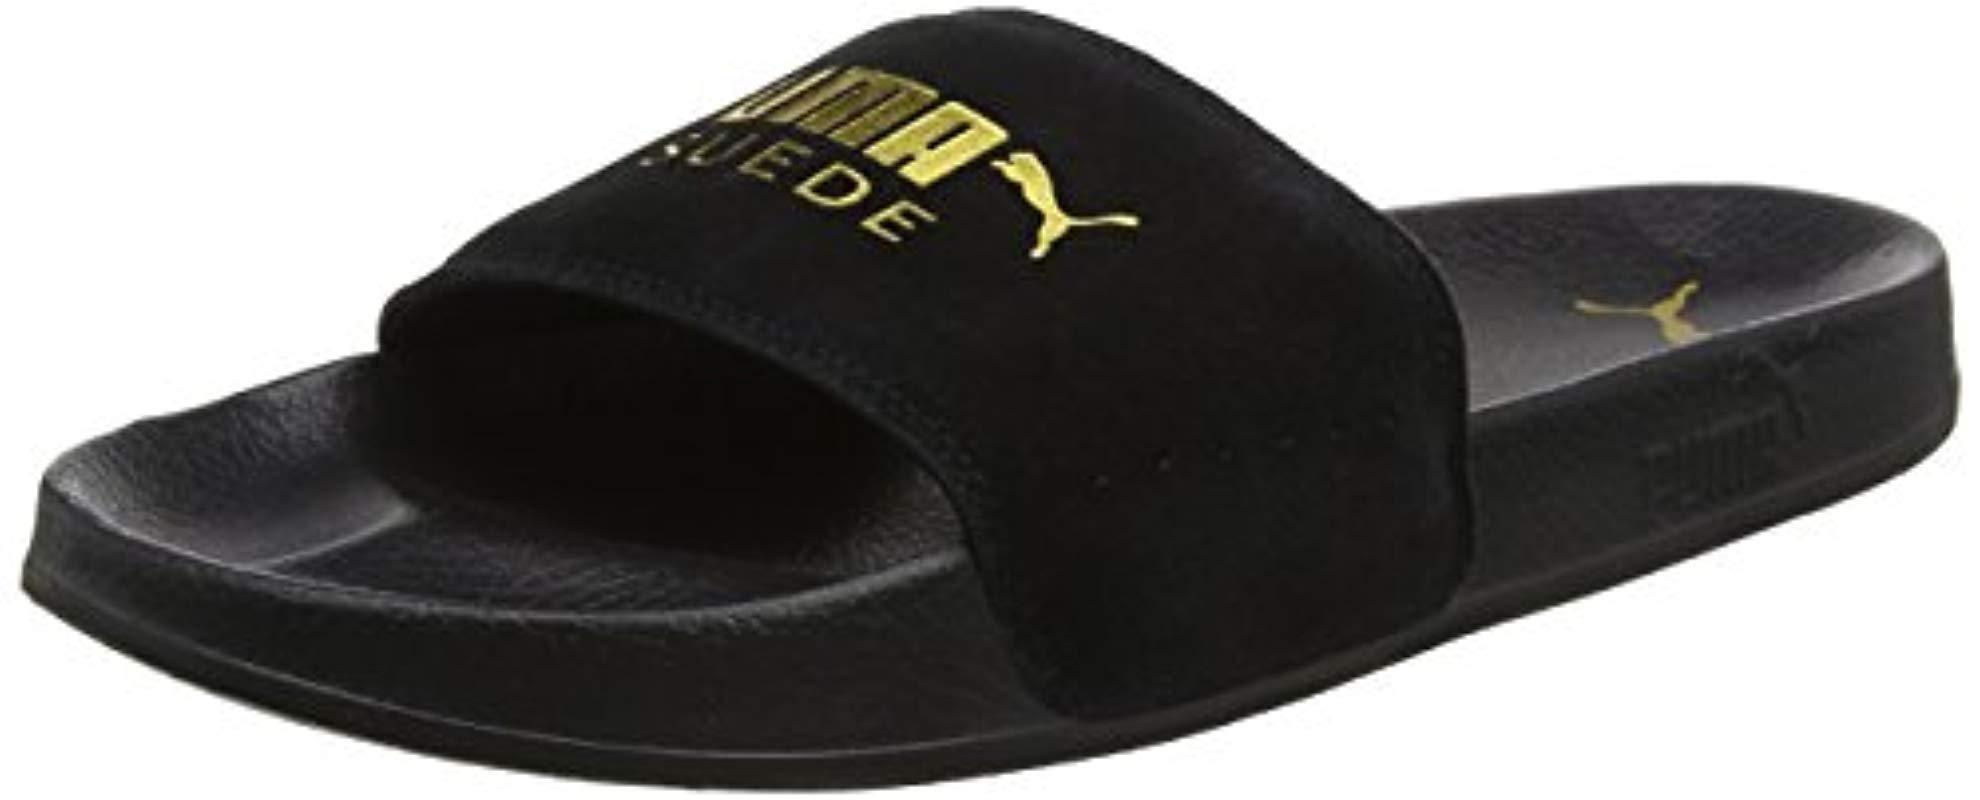 644b71e154b8bb Puma Unisex Adults' Leadcat Suede Beach & Pool Shoes Black in Black ...